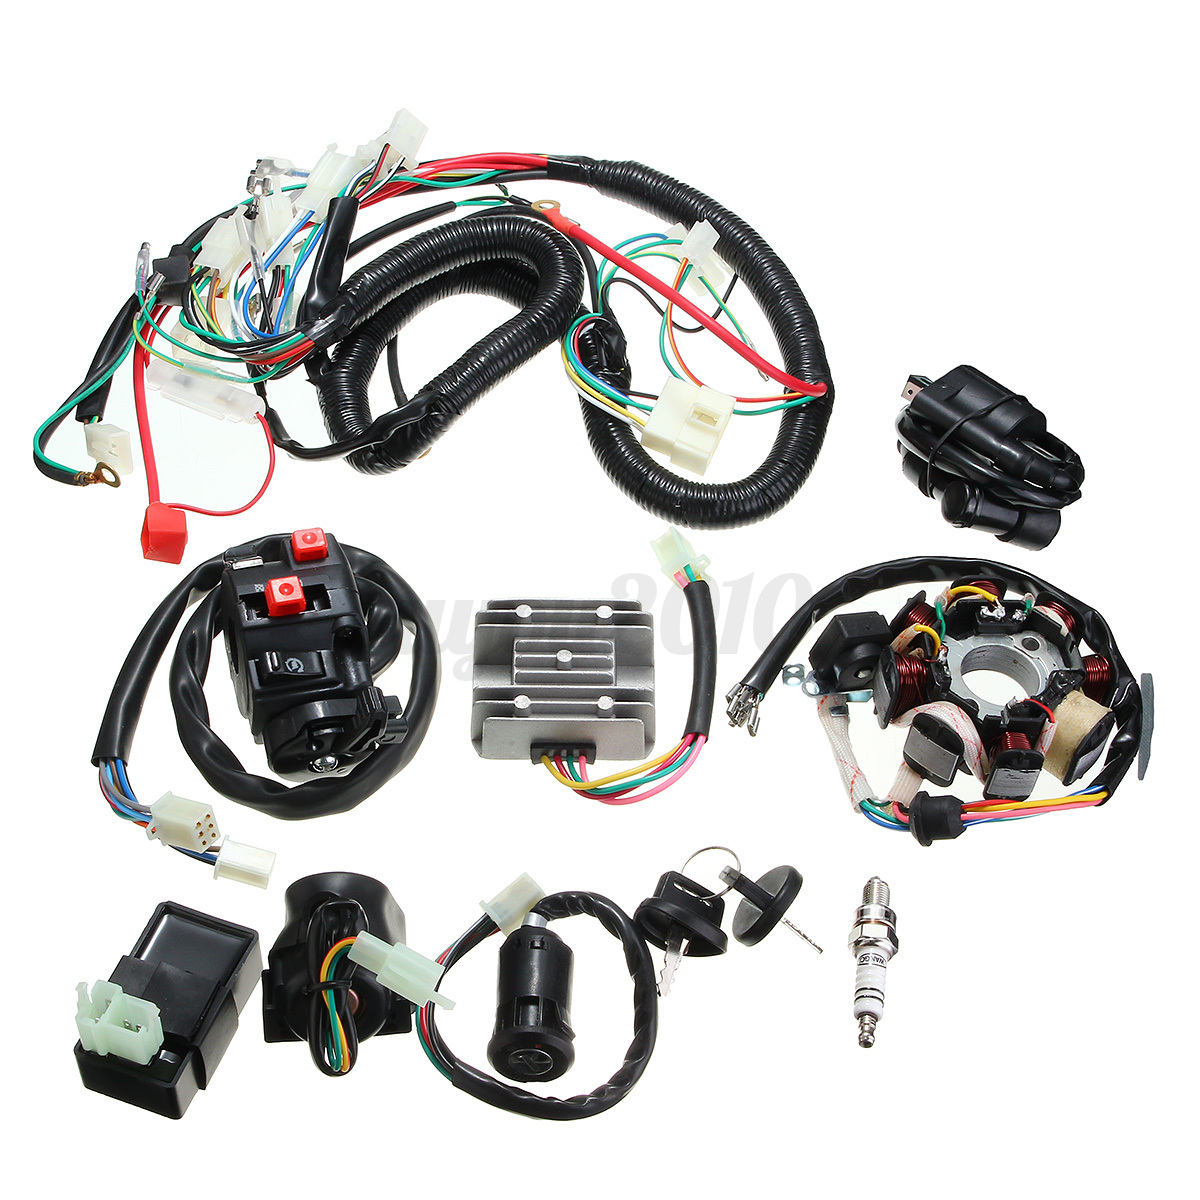 Electrics Wiring Harness Wire Loom Atv Quad 125 150 200 250cc Stator 107 Detail Image